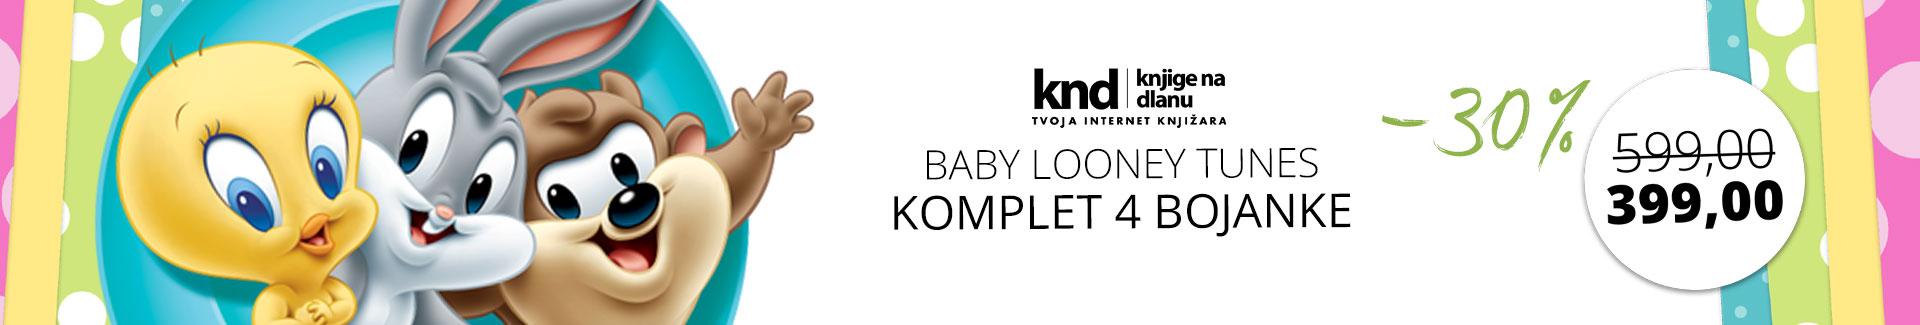 KOMPLET BOJANKE LOONEY TUNES